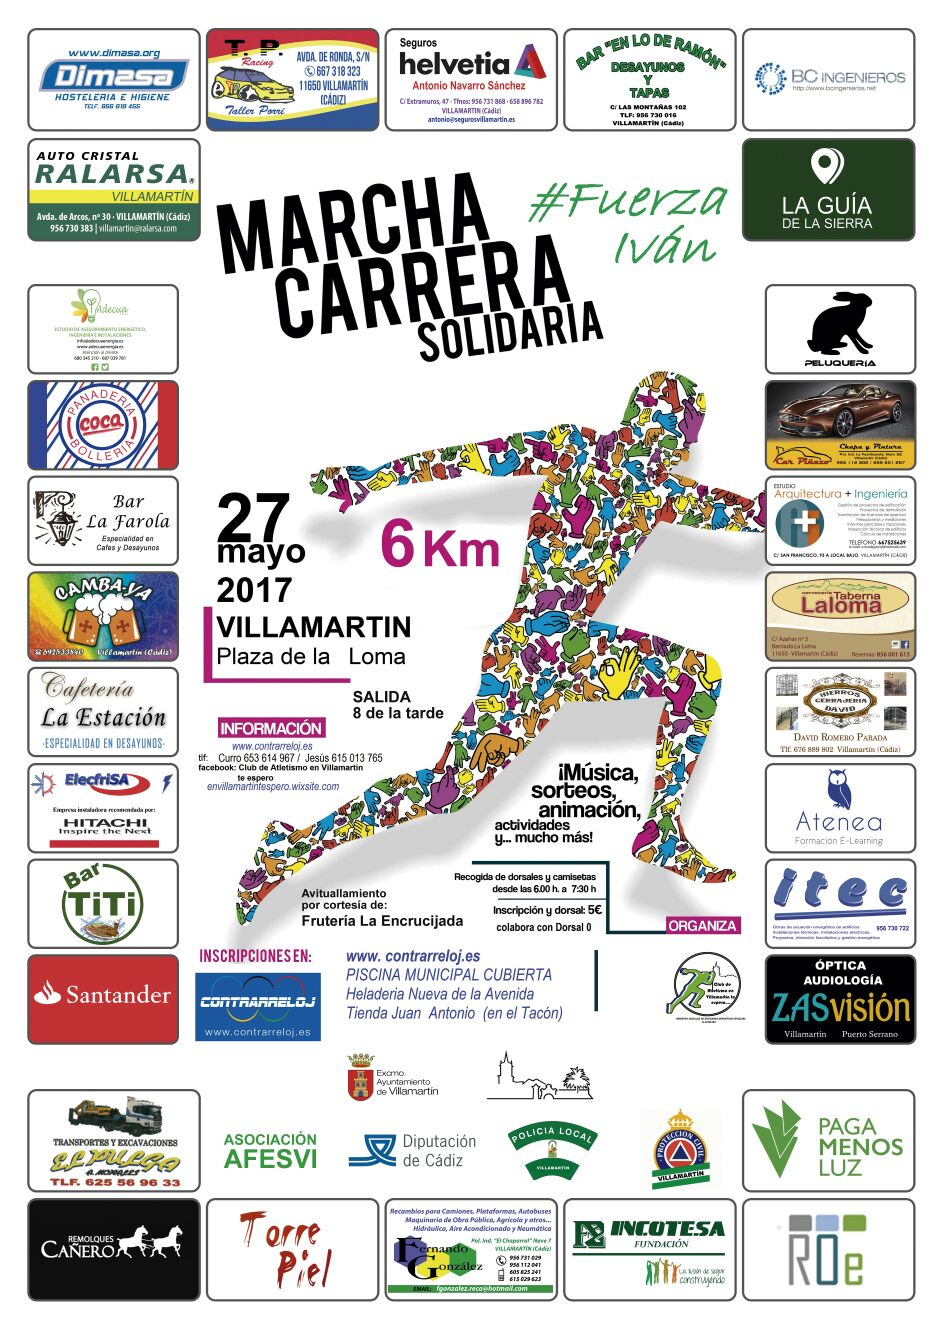 2017_05_carrera_solidaria_fuerzaivan